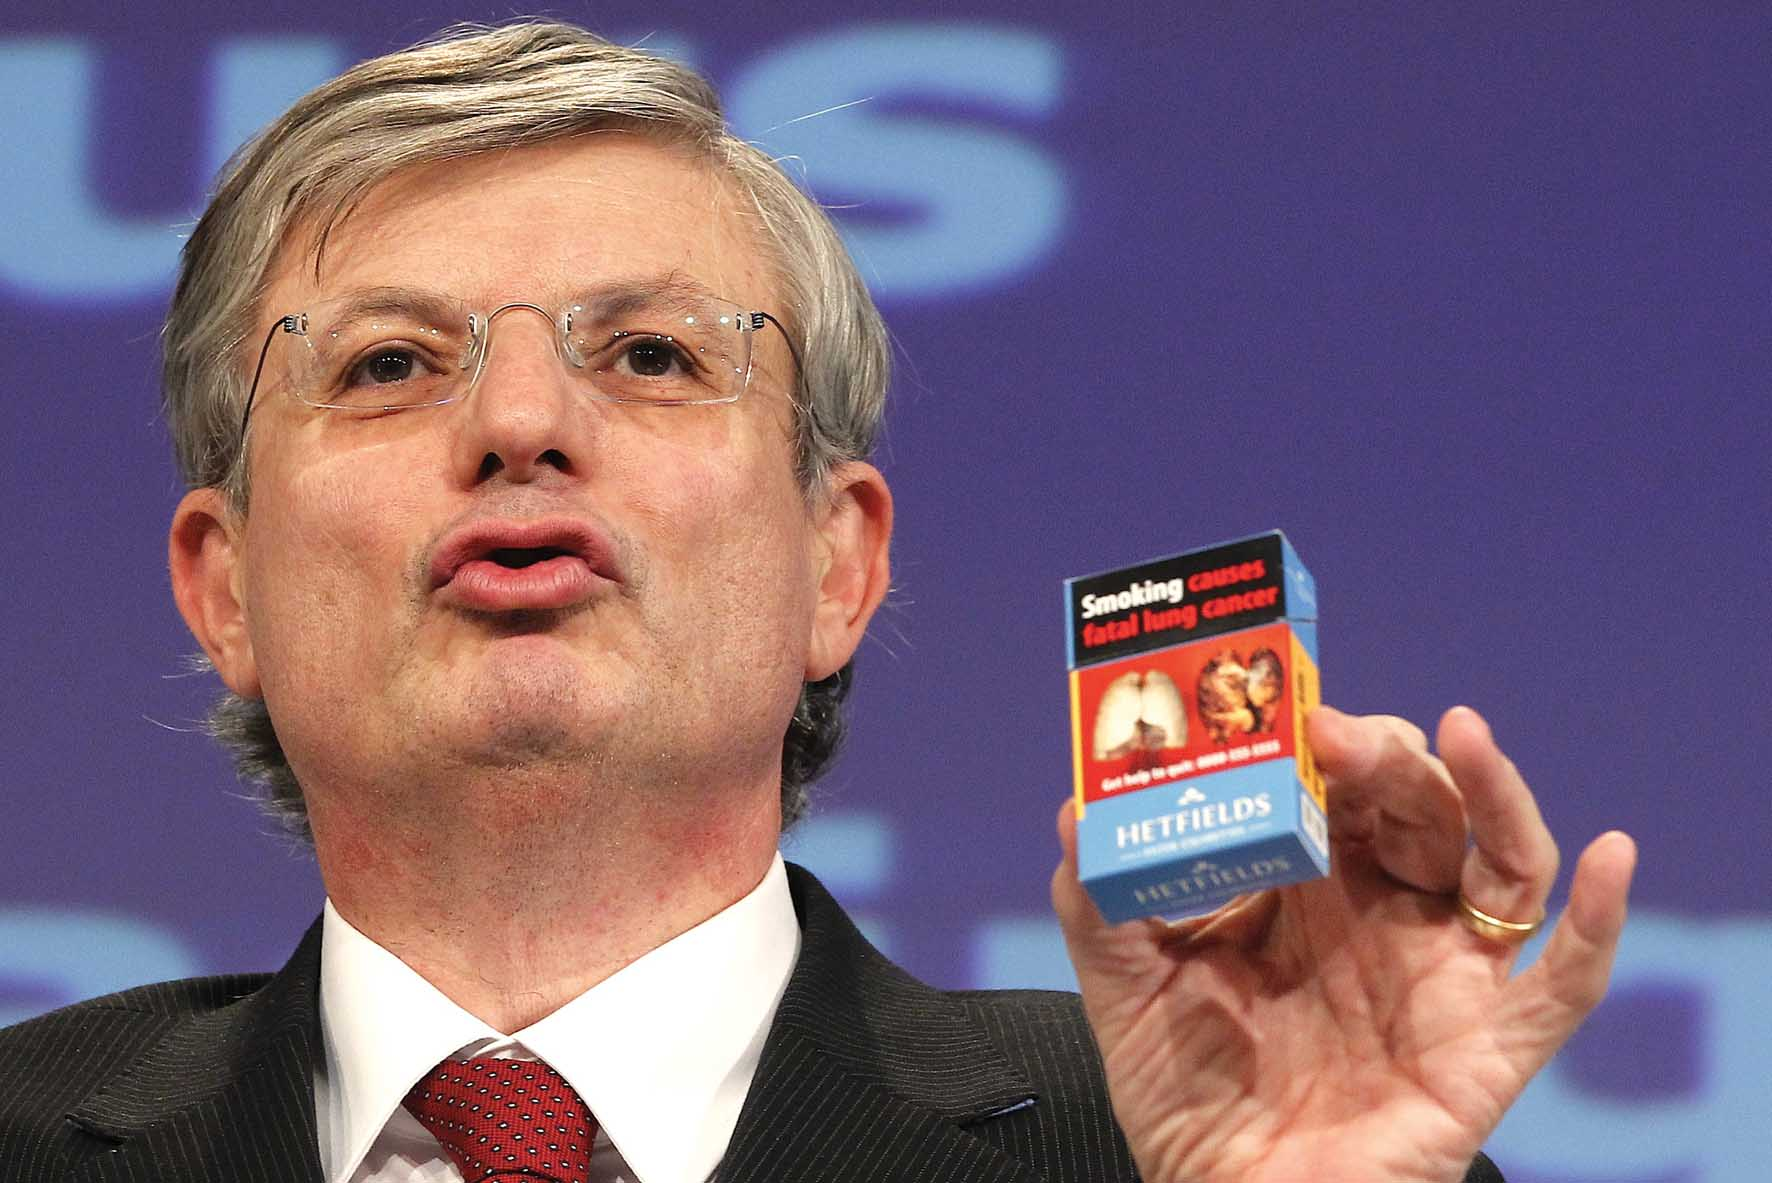 Tonio Borg commissario UE salute pacchetto sigarette 1